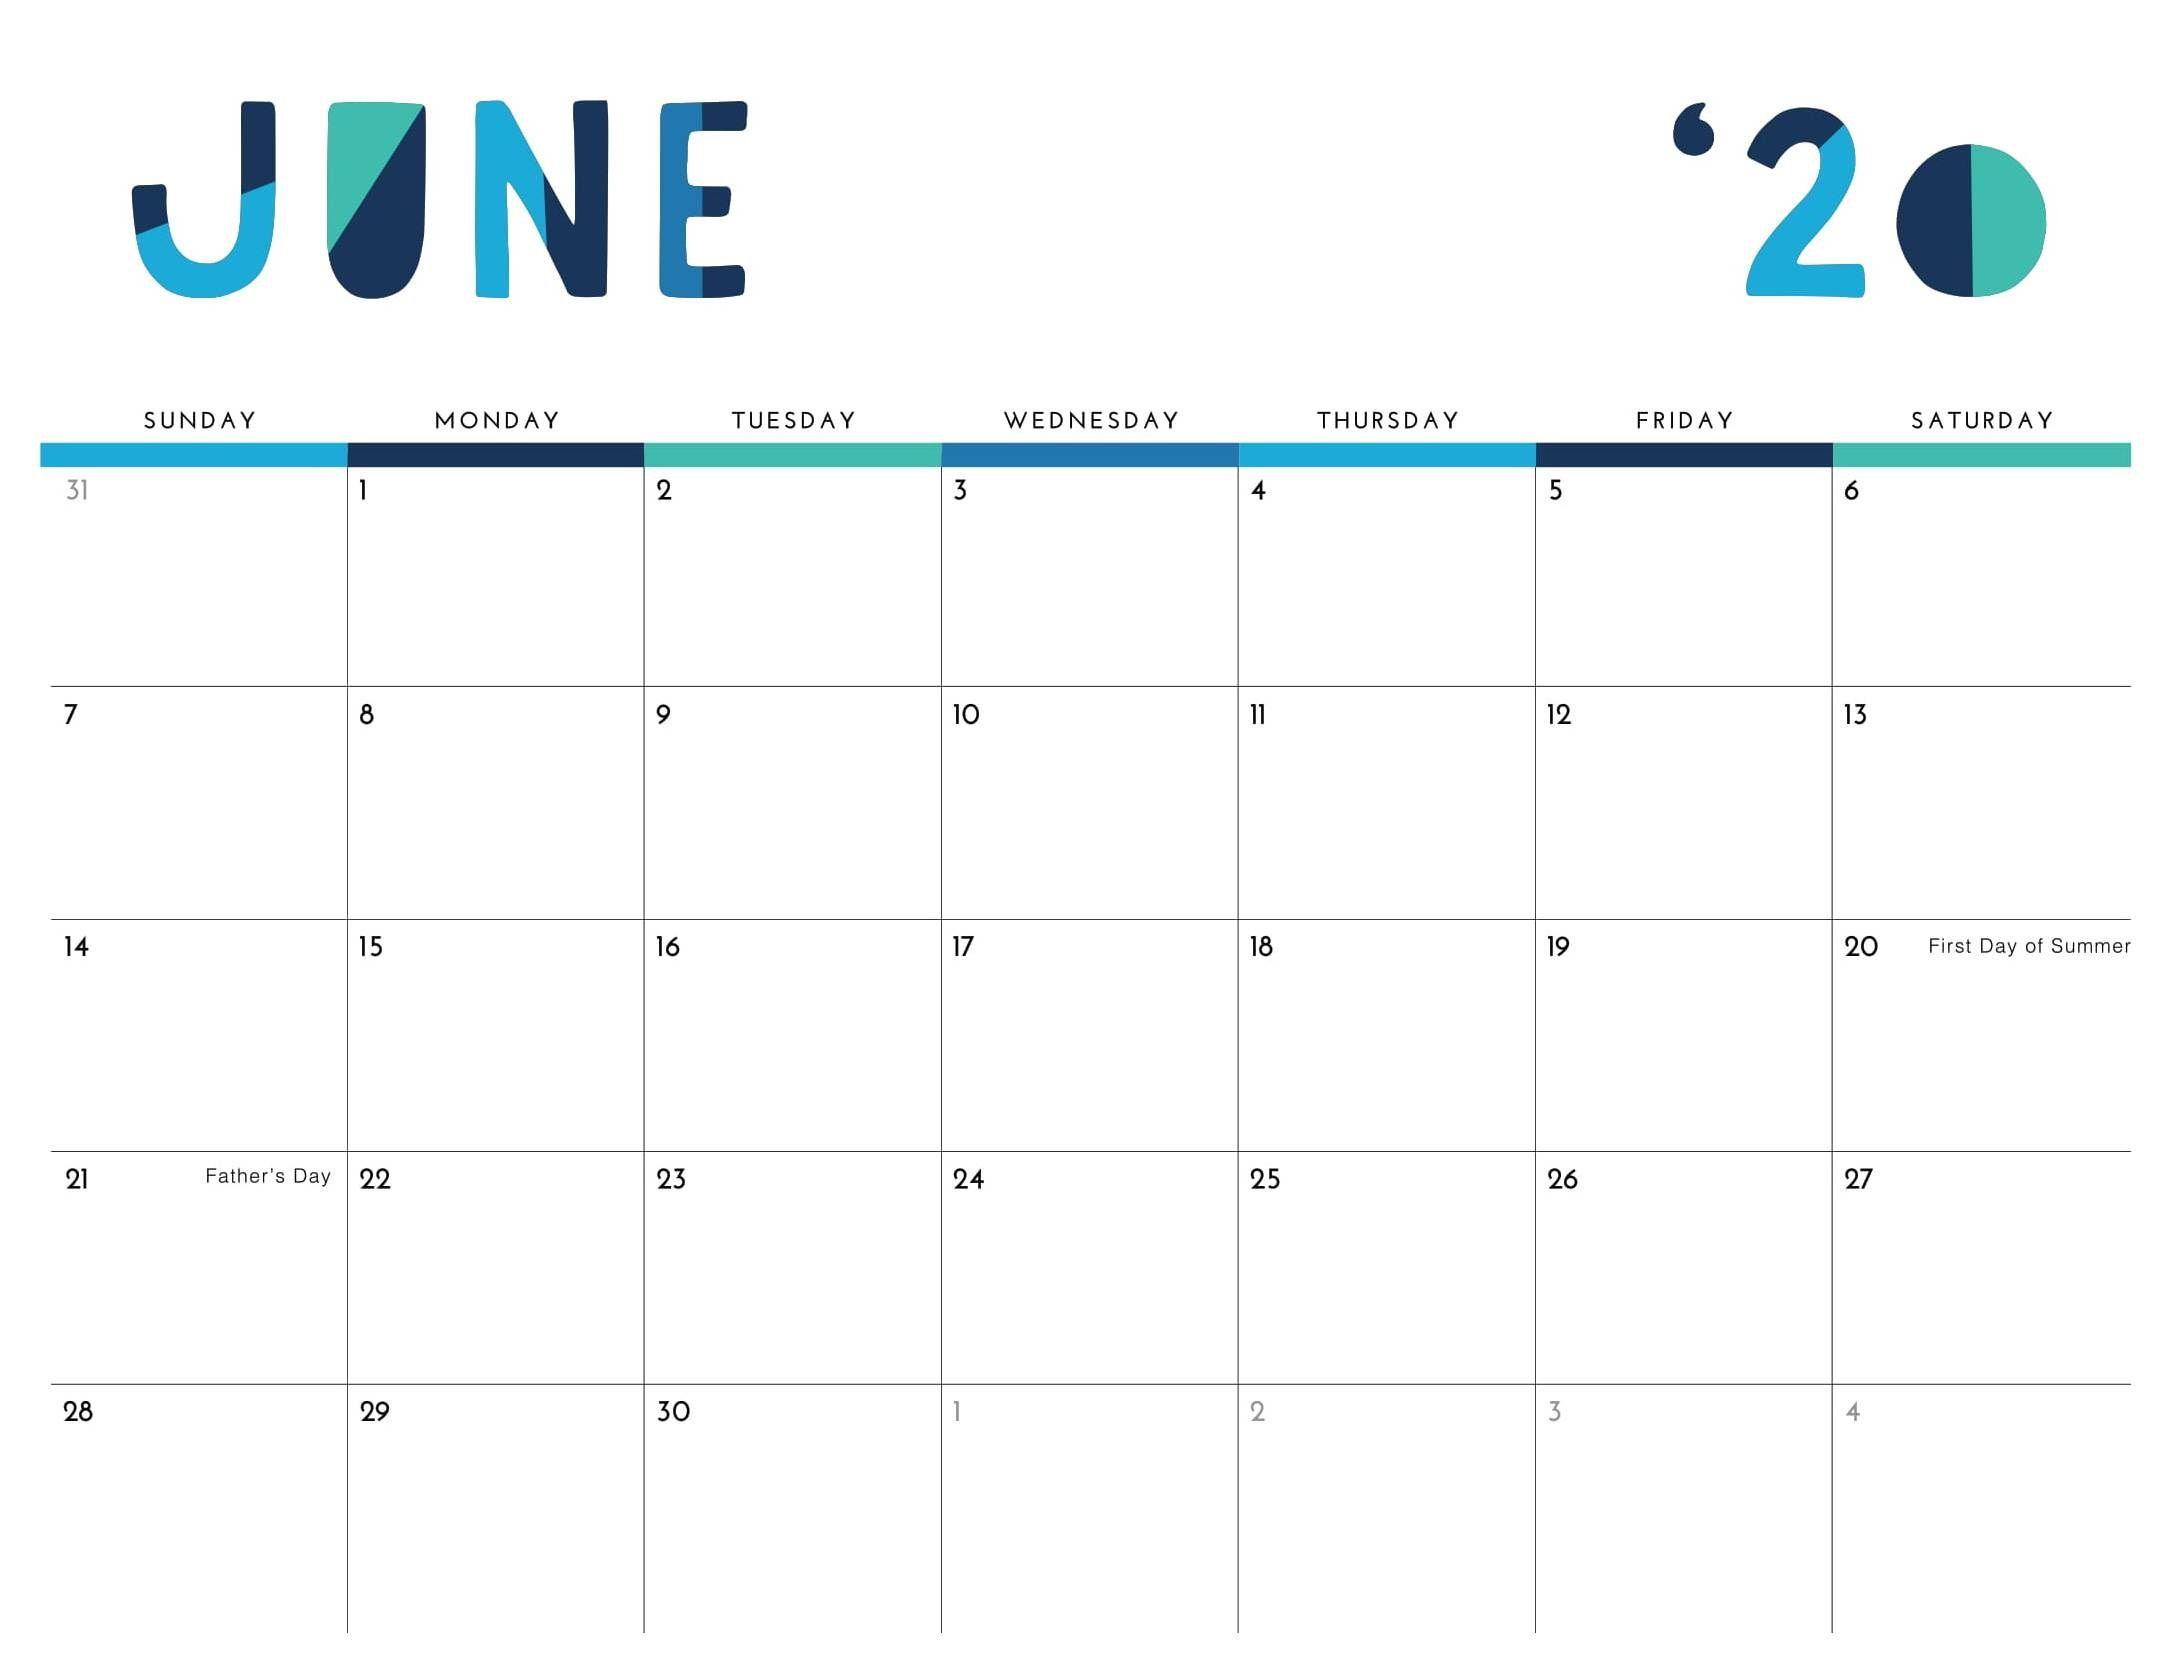 002 Outstanding June 2020 Monthly Calendar Template High Definition Full